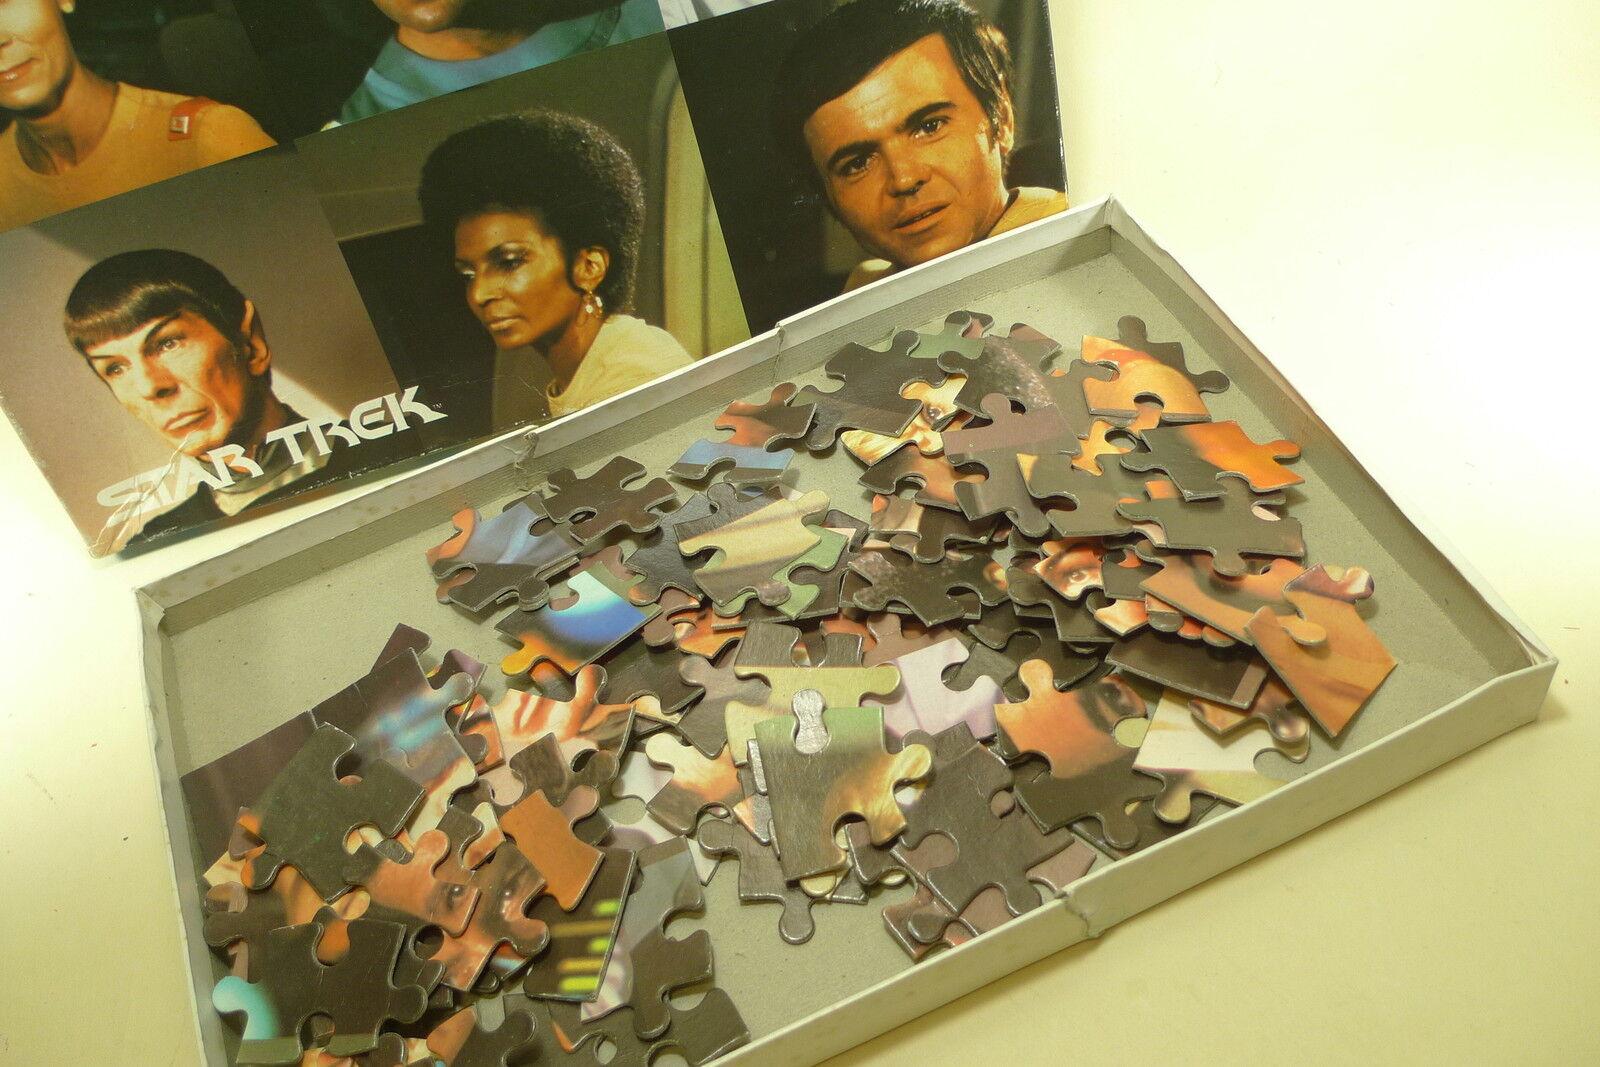 STAR TREK. ARROW PUZZLES    (complet) Vintage  1979.  (complet)  567227